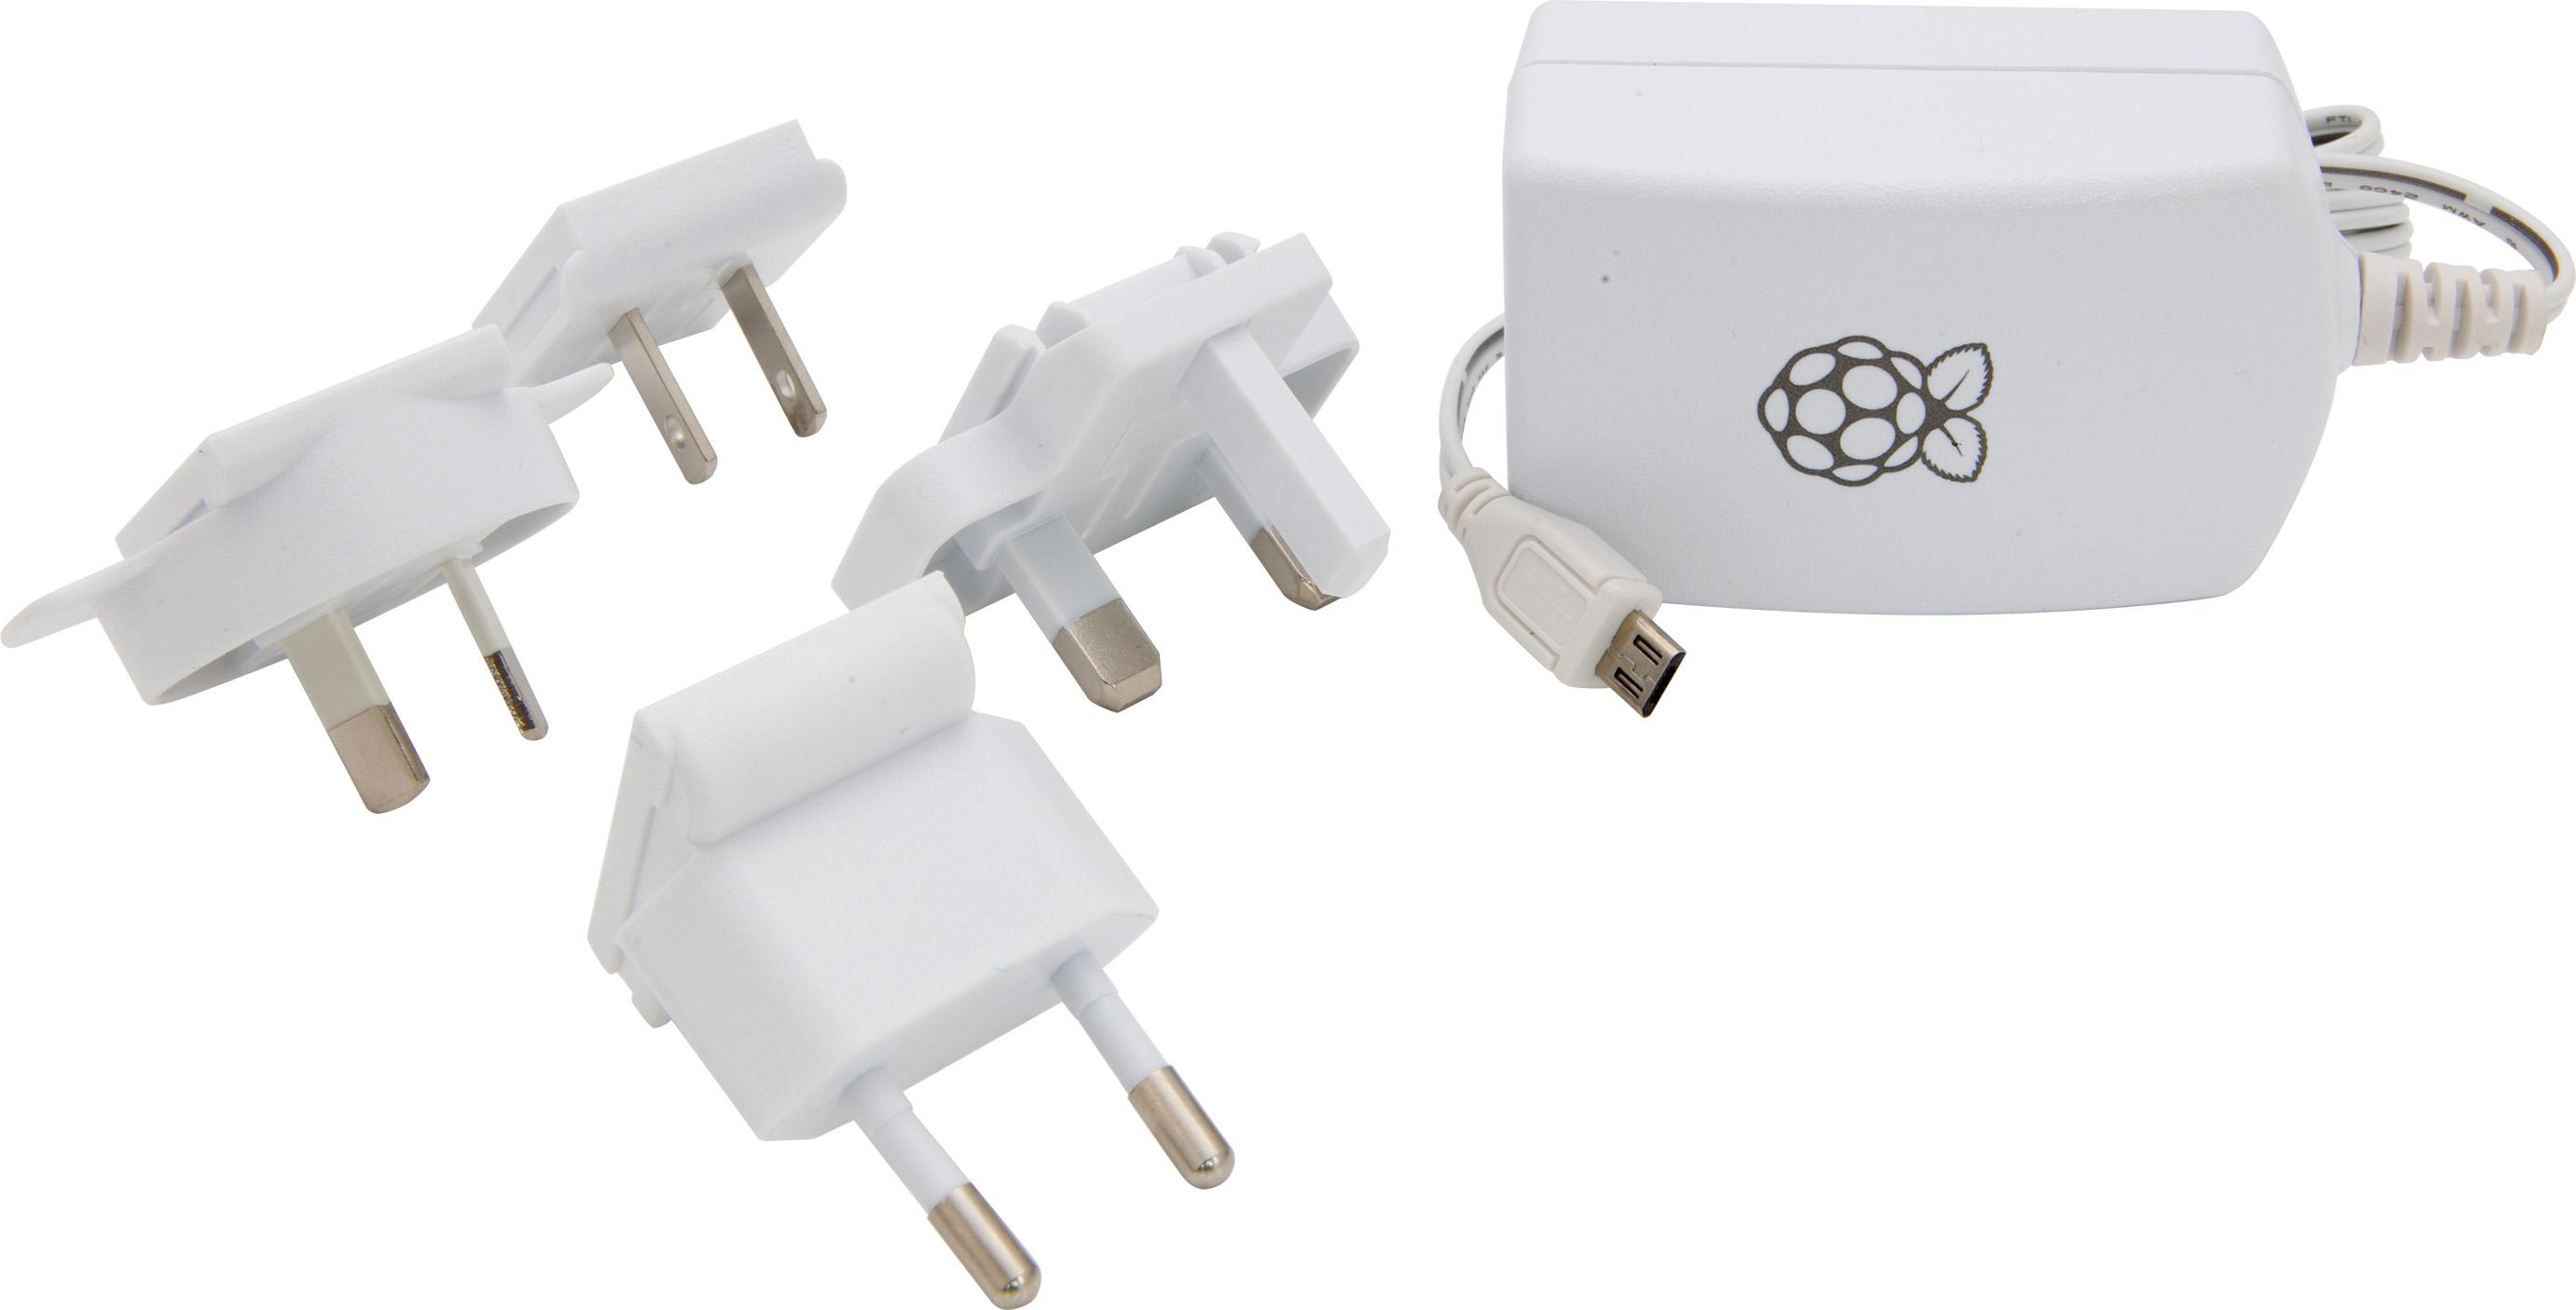 Bloc d'alimentation micro-USB 2,5 A Stontronics pour Raspberry Pi 3 – T5875DV